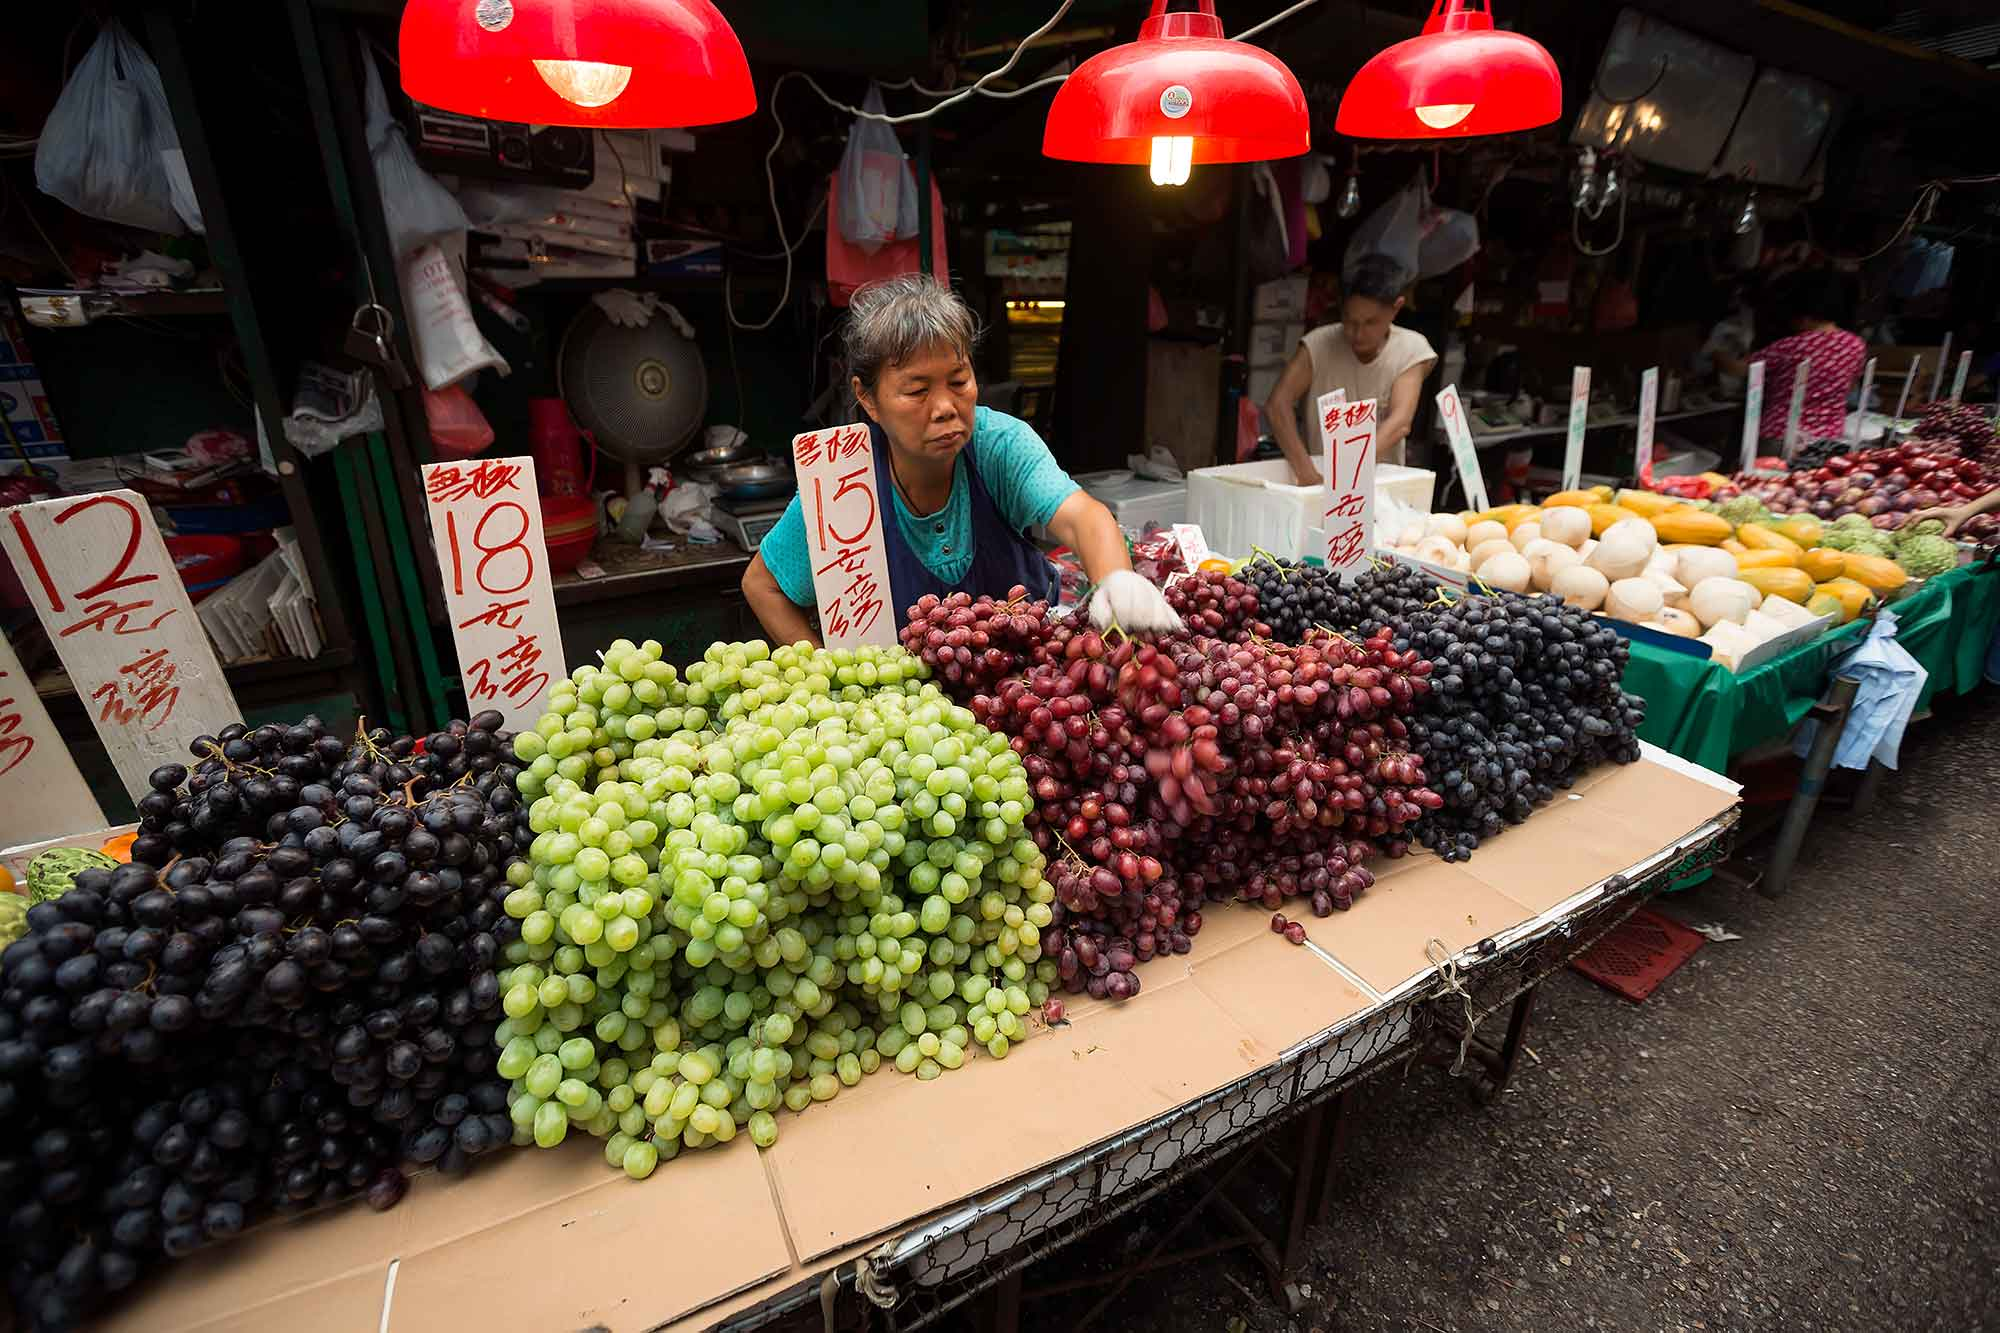 Market life at Yoa Matei fresh market in Mong Kok, Hong Kong. © Ulli Maier & Nisa Maier